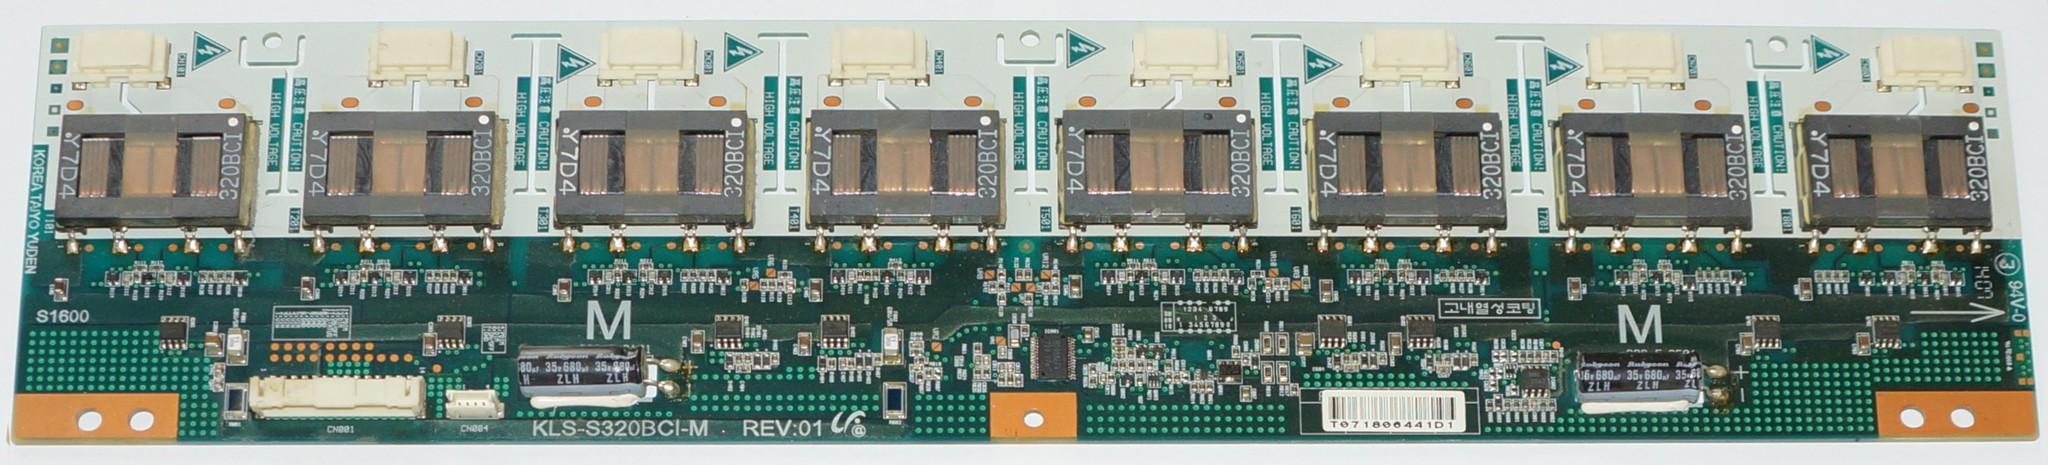 KLS-S320BCI-M REV01 инвертор телевизора Sony